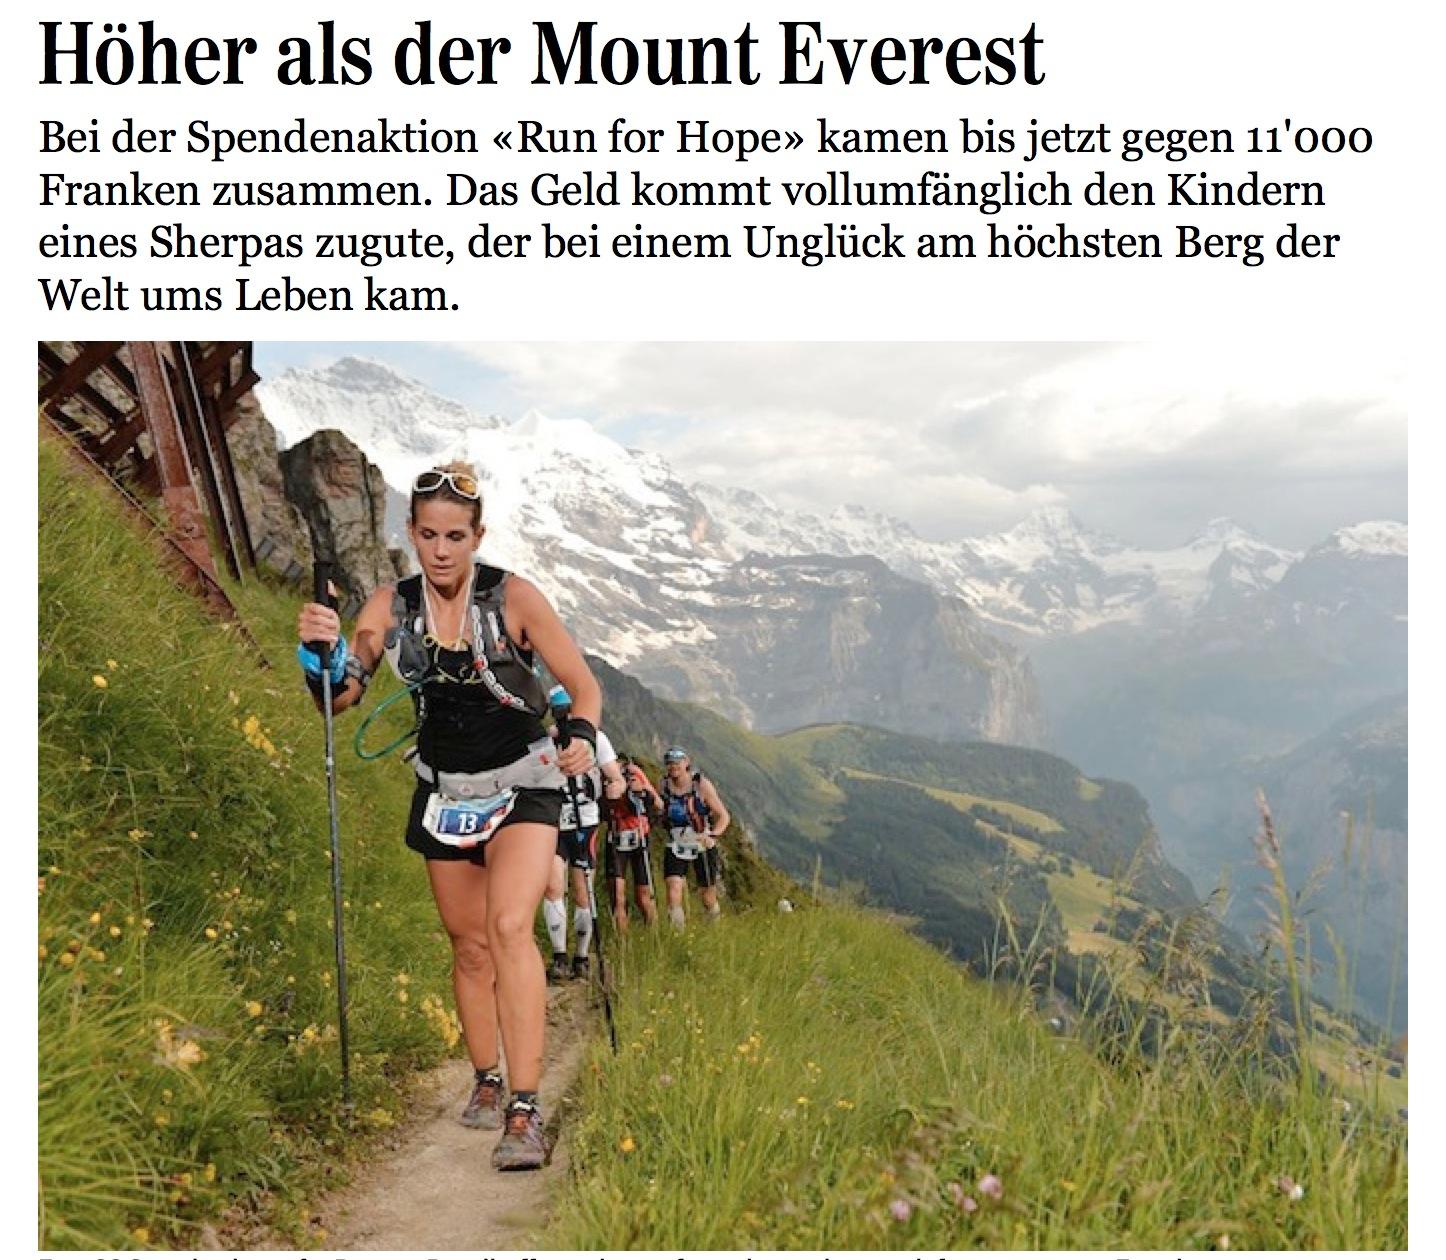 Jungfrau Zeitung, 12. August 2014